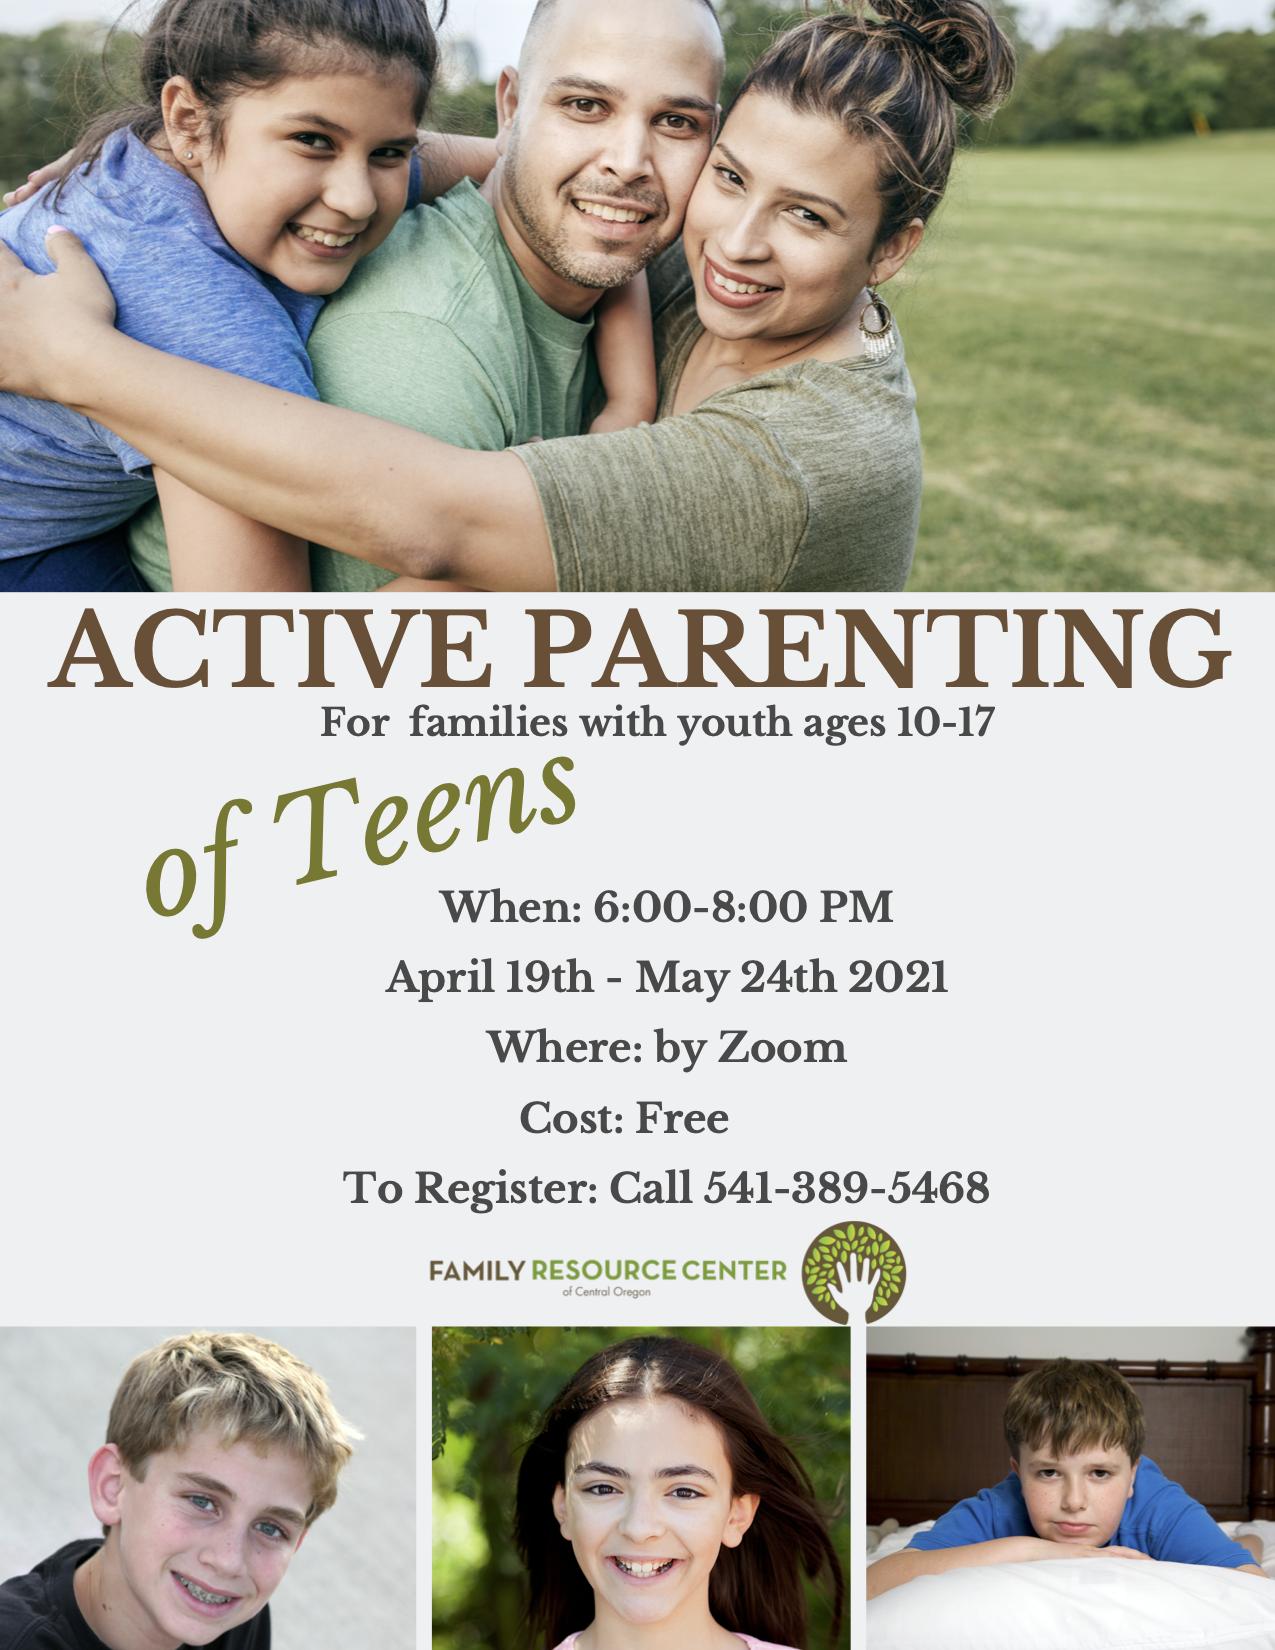 Active Parenting of Teens